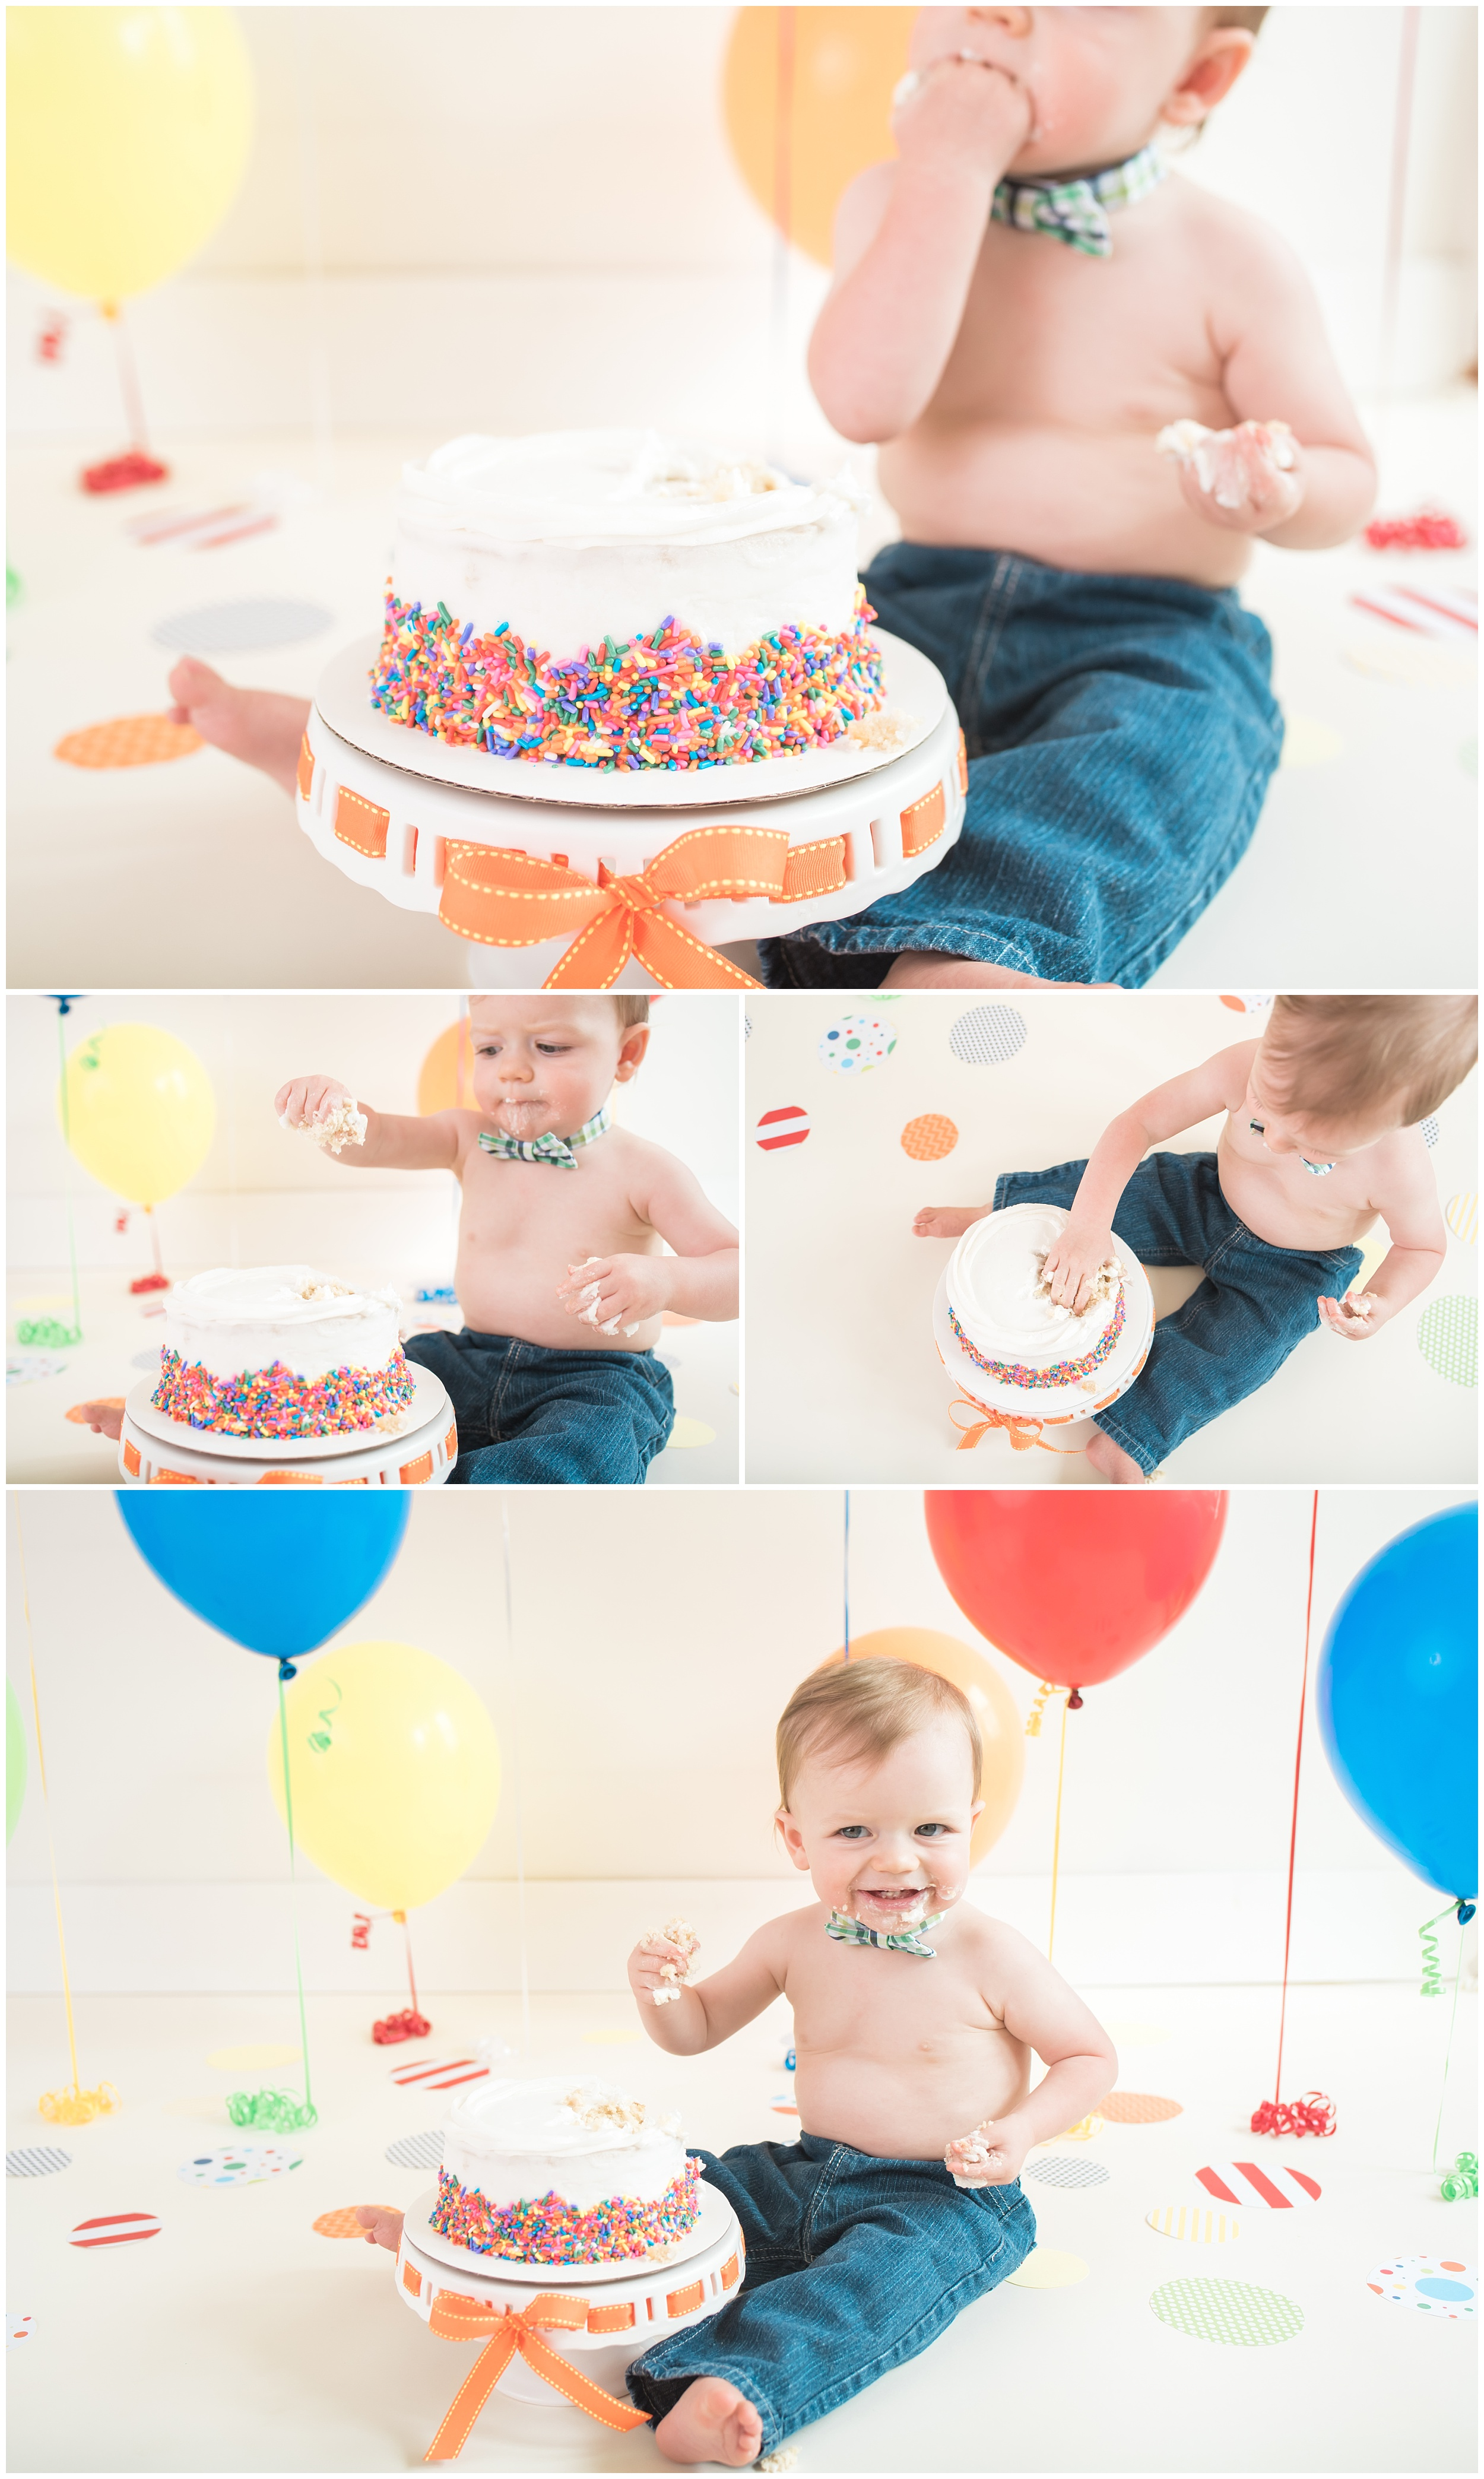 Greenville Cake Smash Photographer